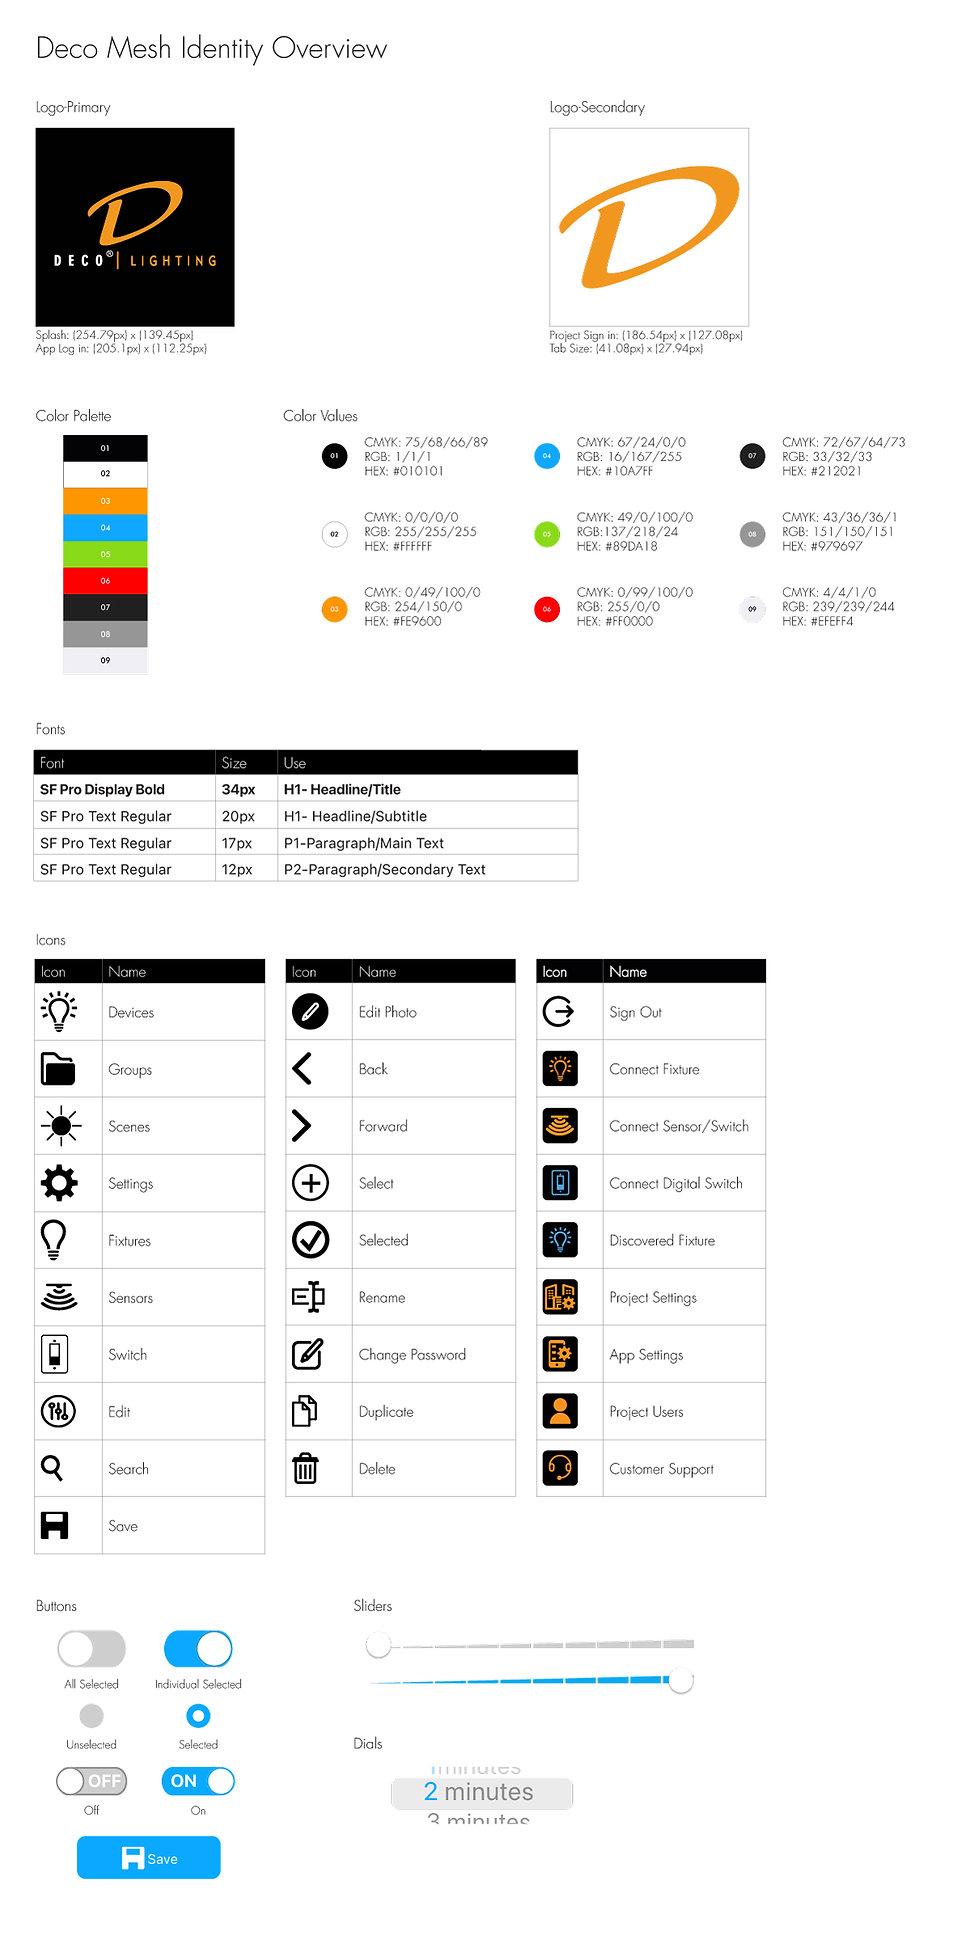 Deco-Mesh-Identity-Overview.jpg